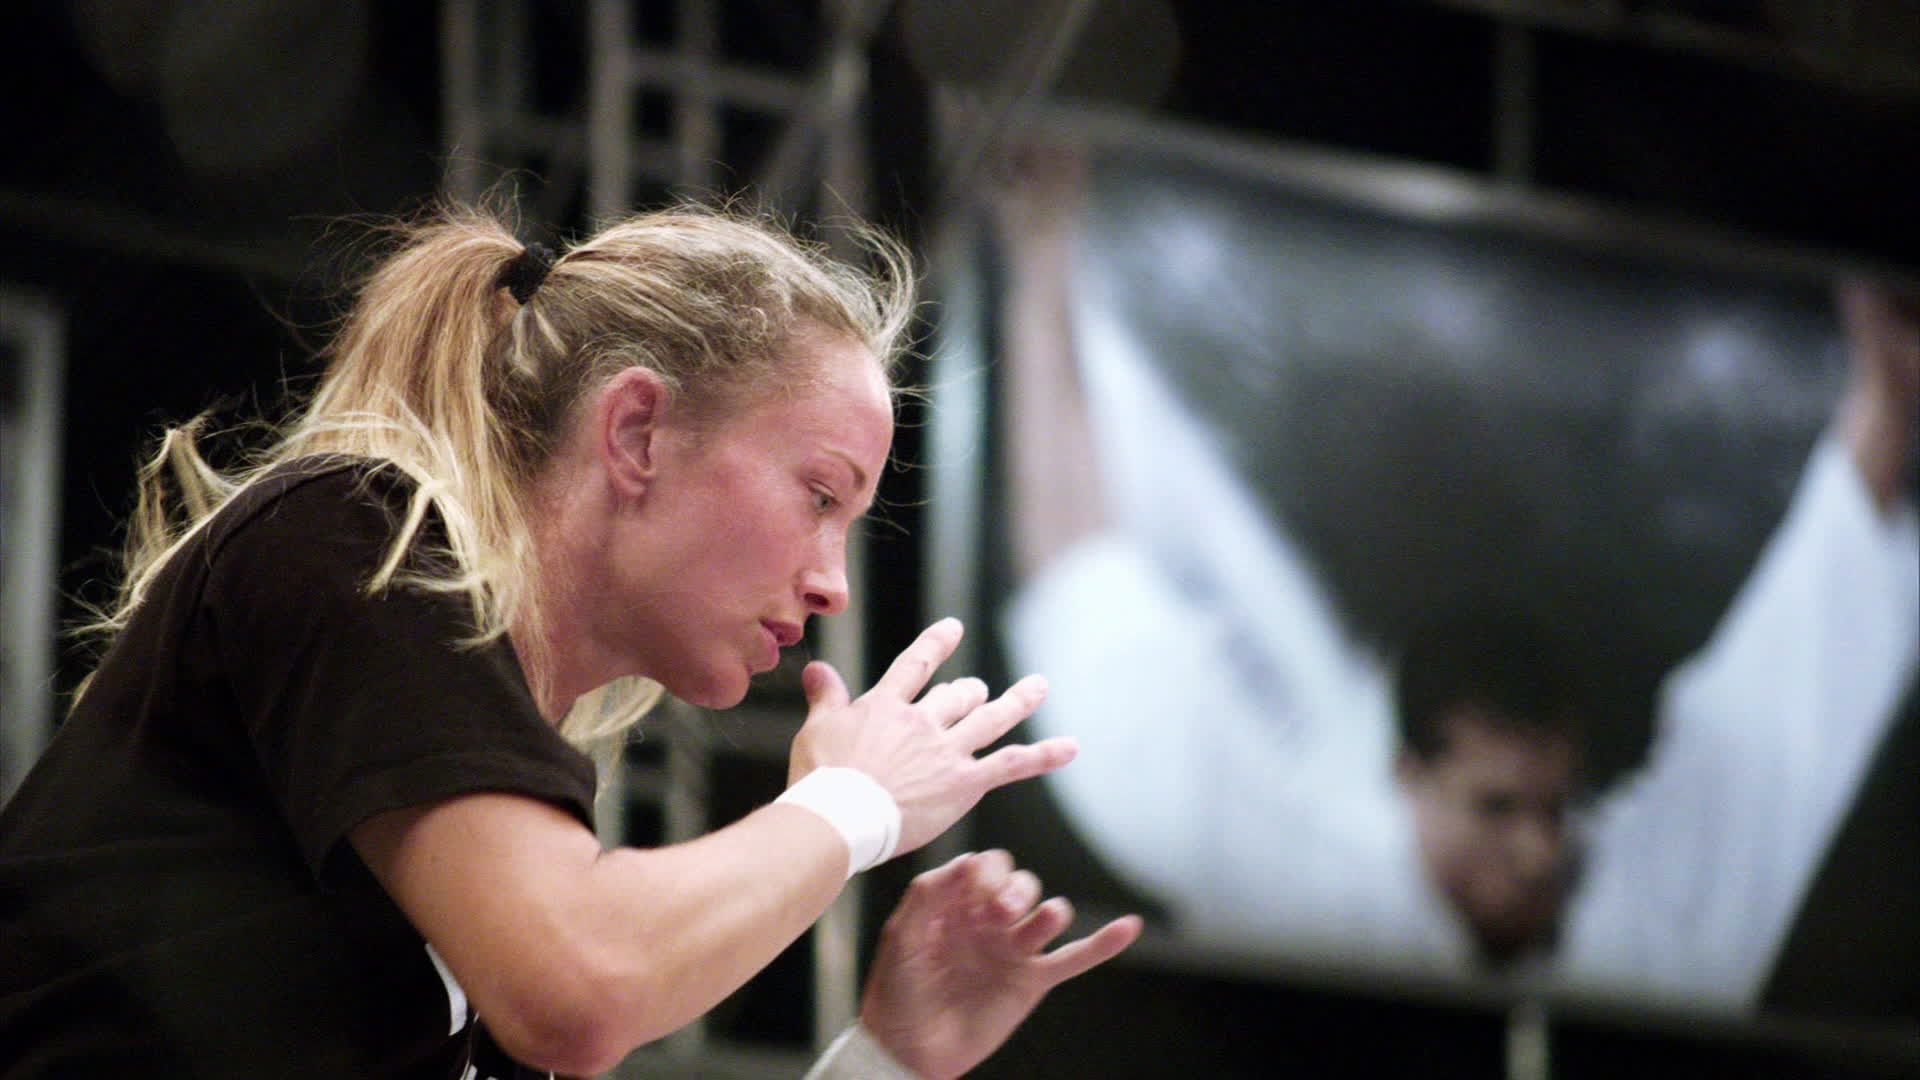 Jessica Rakoczy shadowboxing